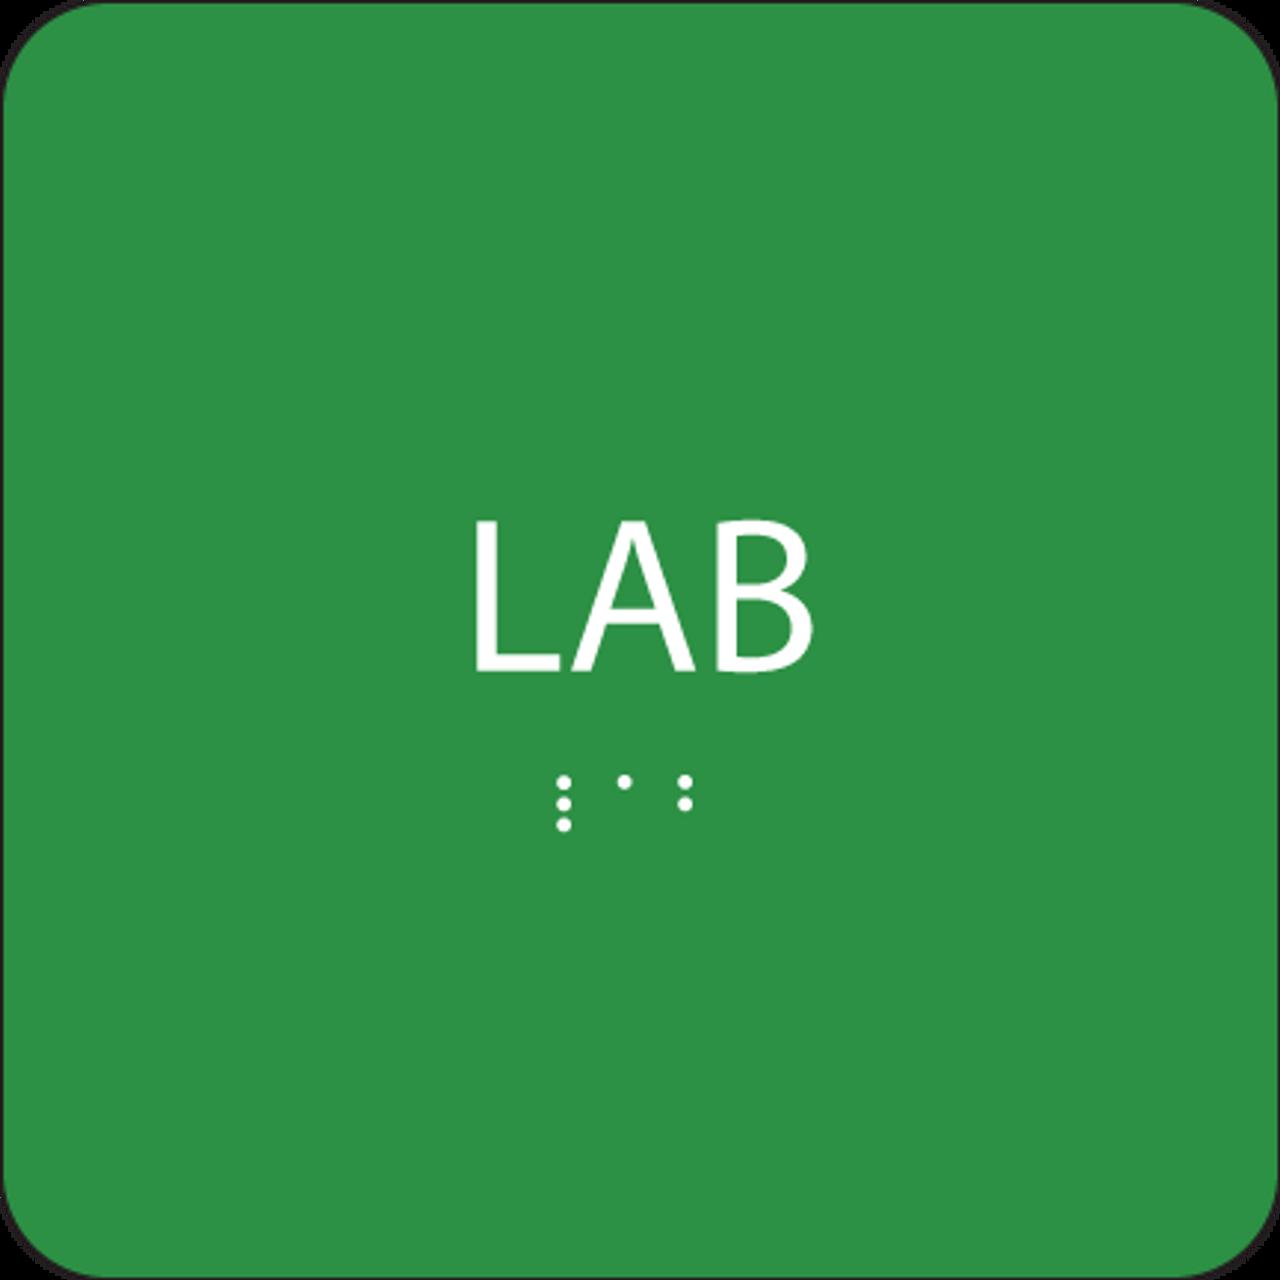 Green Lab ADA Sign